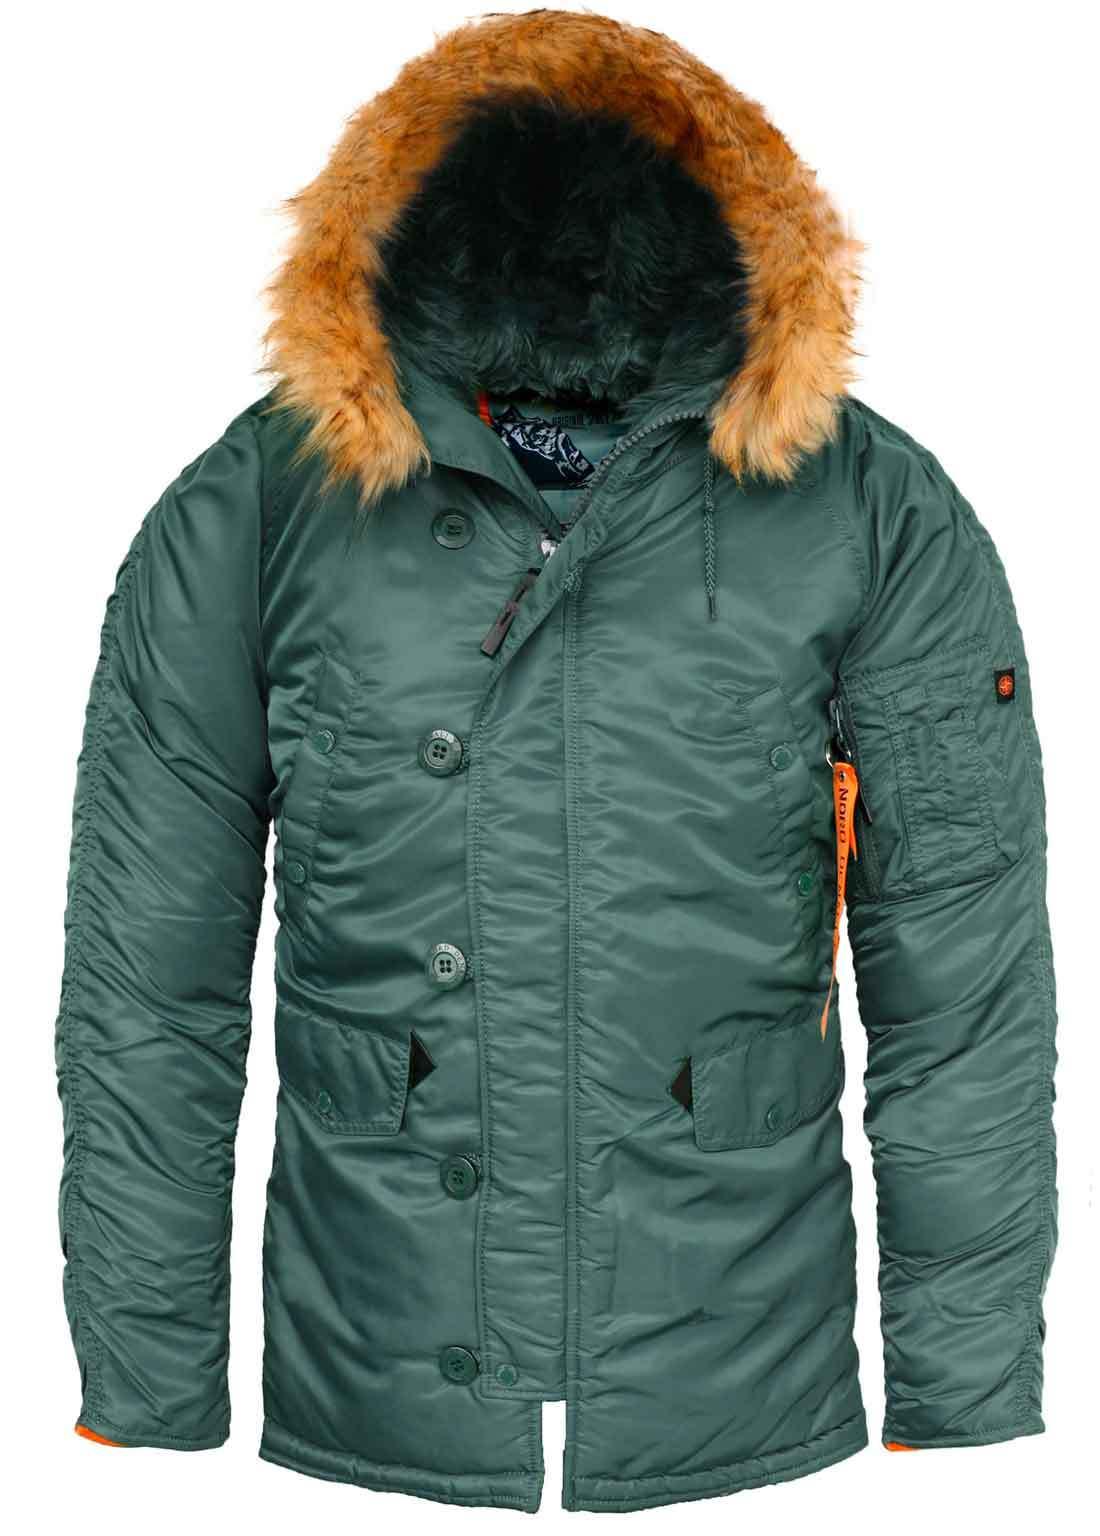 Куртка Аляска  N-3B  Husky Denali (светло-зеленая - supporo/orange)